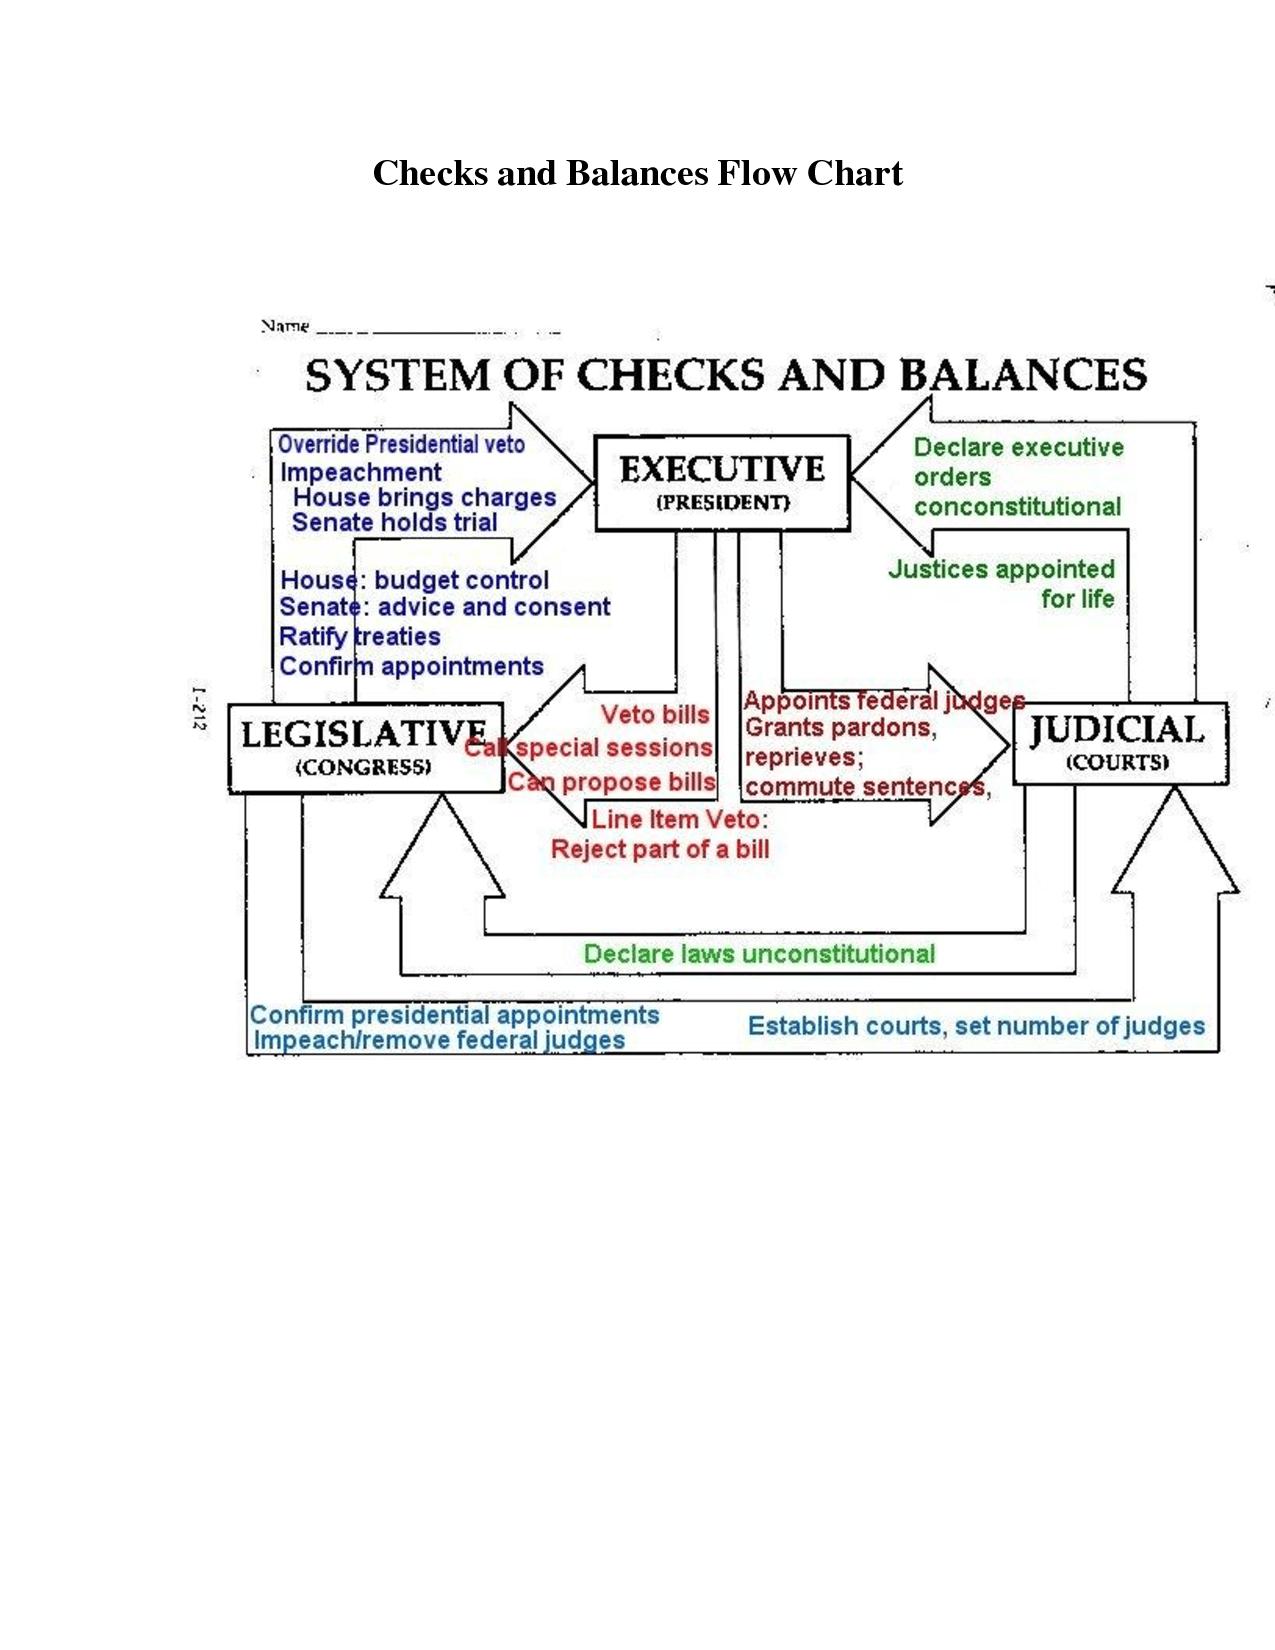 us government checks and balances diagram 2001 ford taurus engine flow chart 5th grade social studies